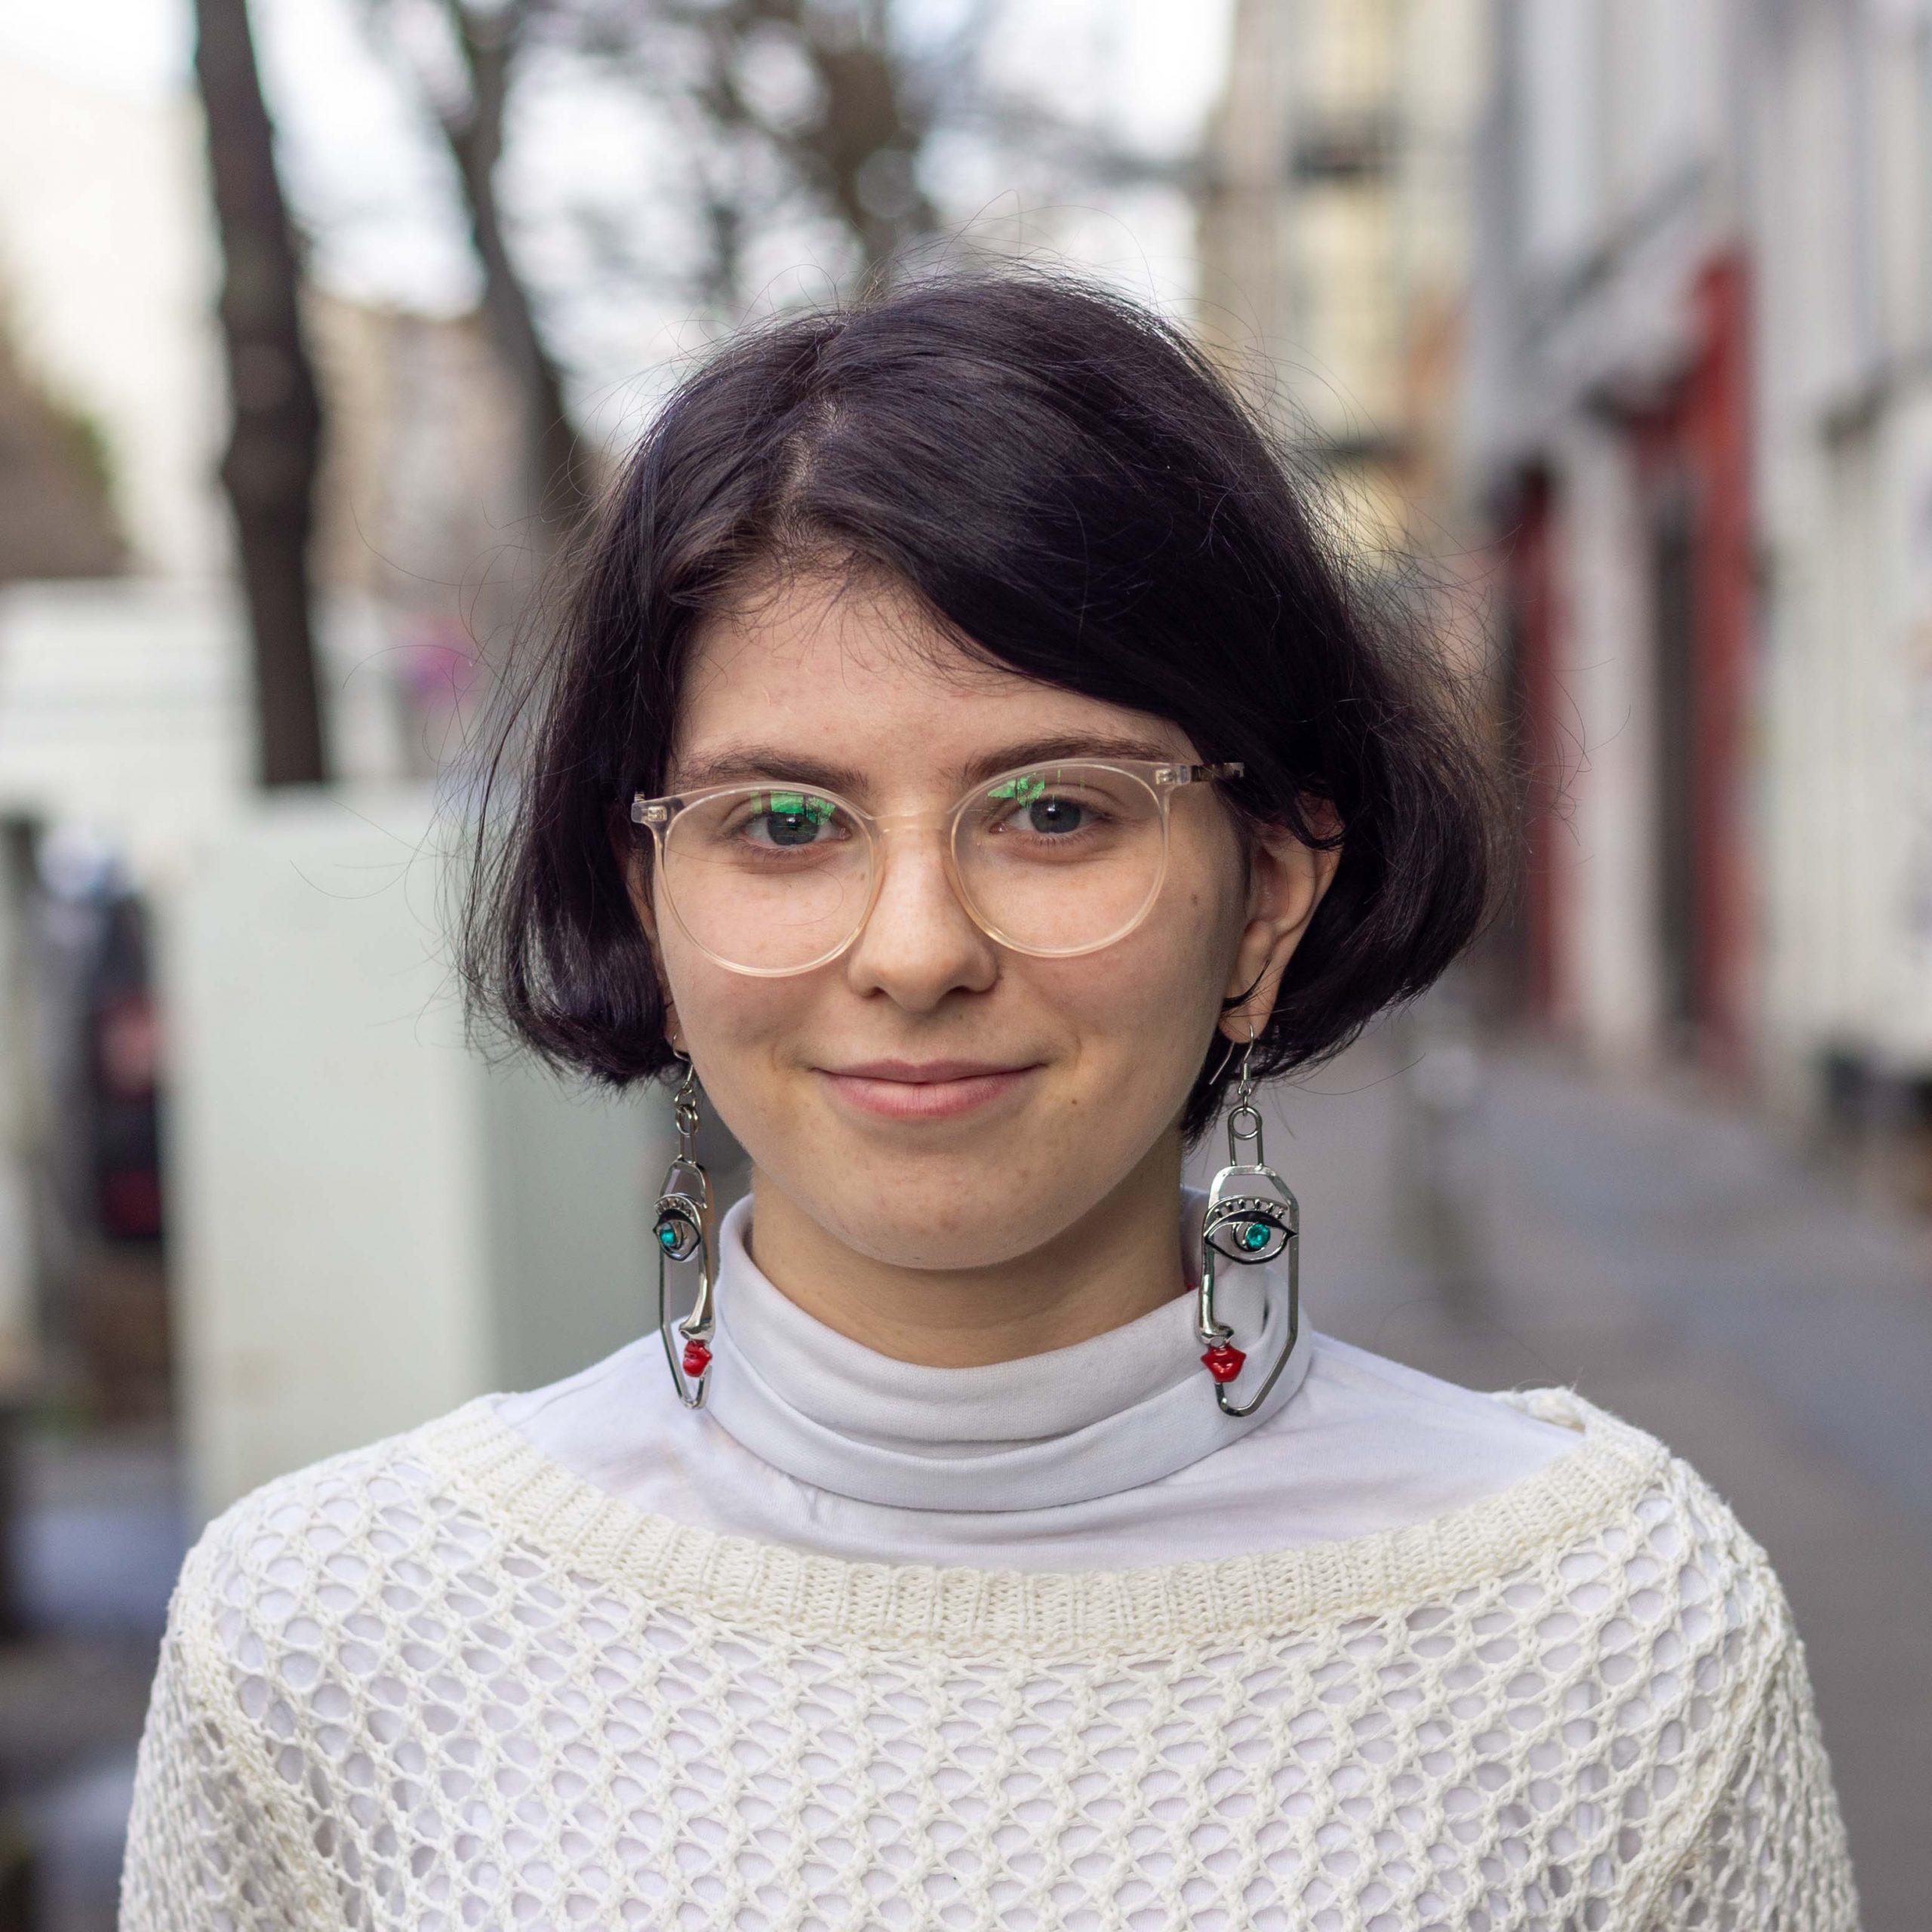 Tanja Zafronskaia